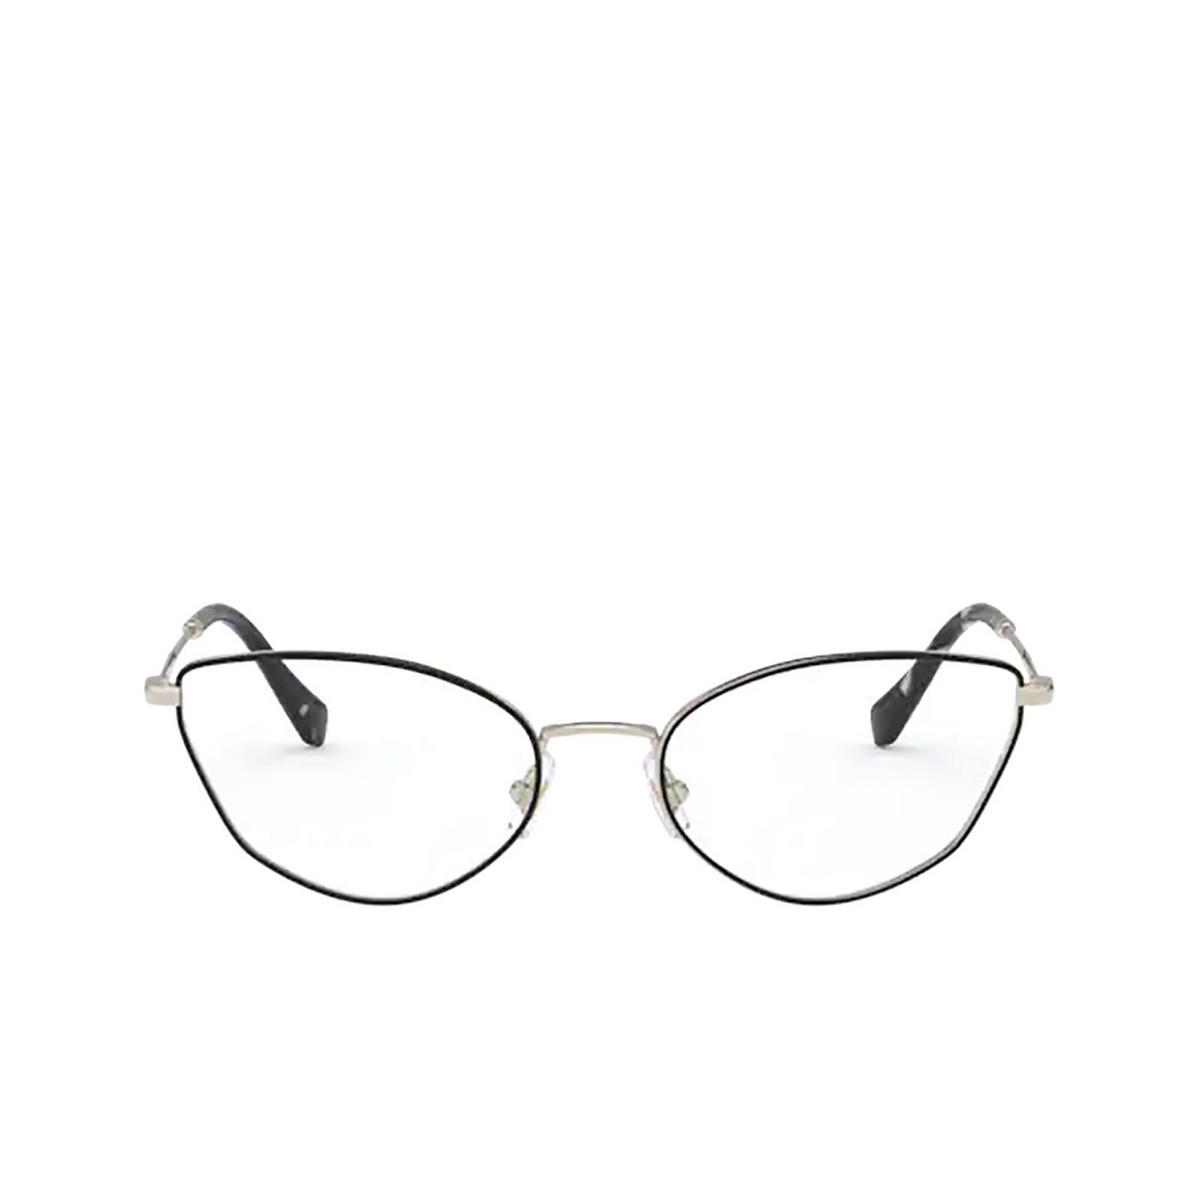 Miu Miu® Cat-eye Eyeglasses: MU 51SV color Pale Gold / Black AAV1O1 - front view.